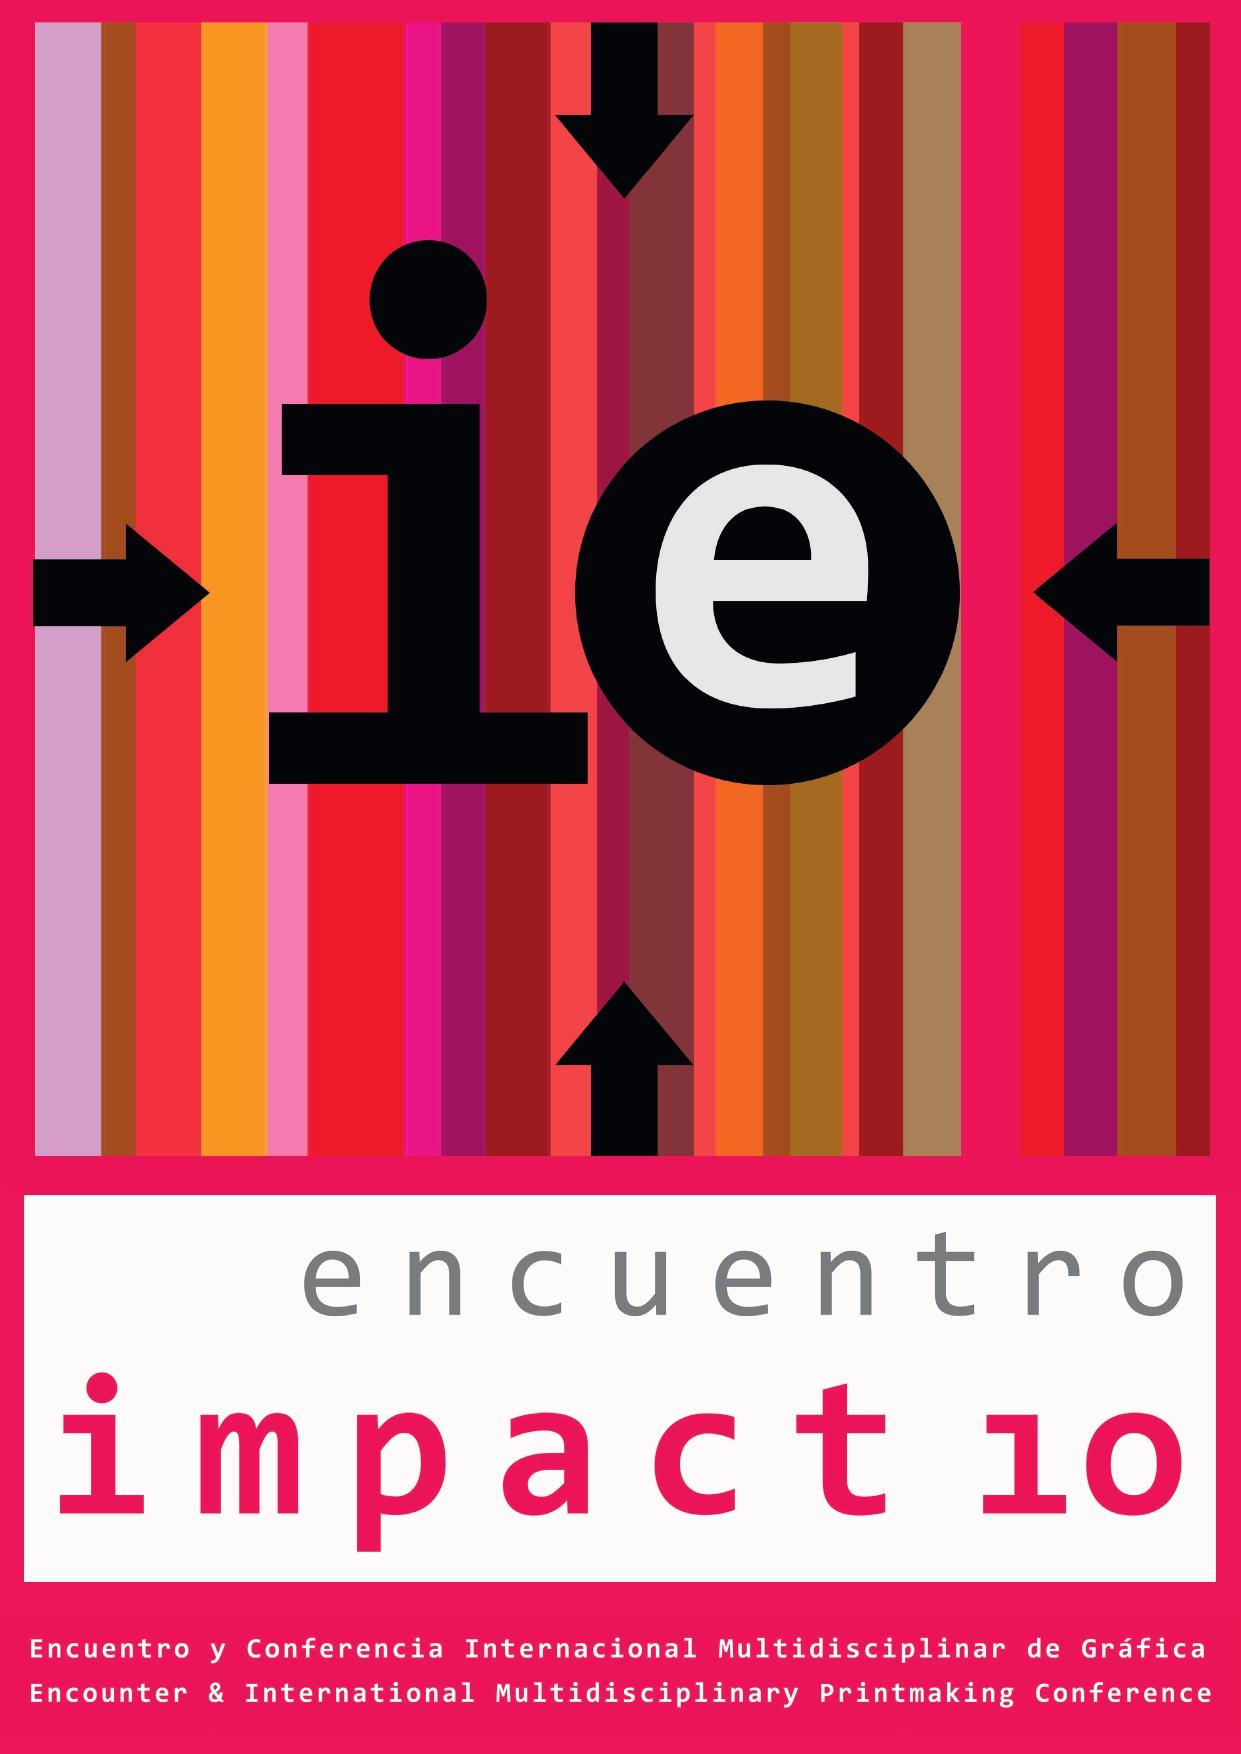 Encuentro Impact 10 Digital_page-0001.jpg